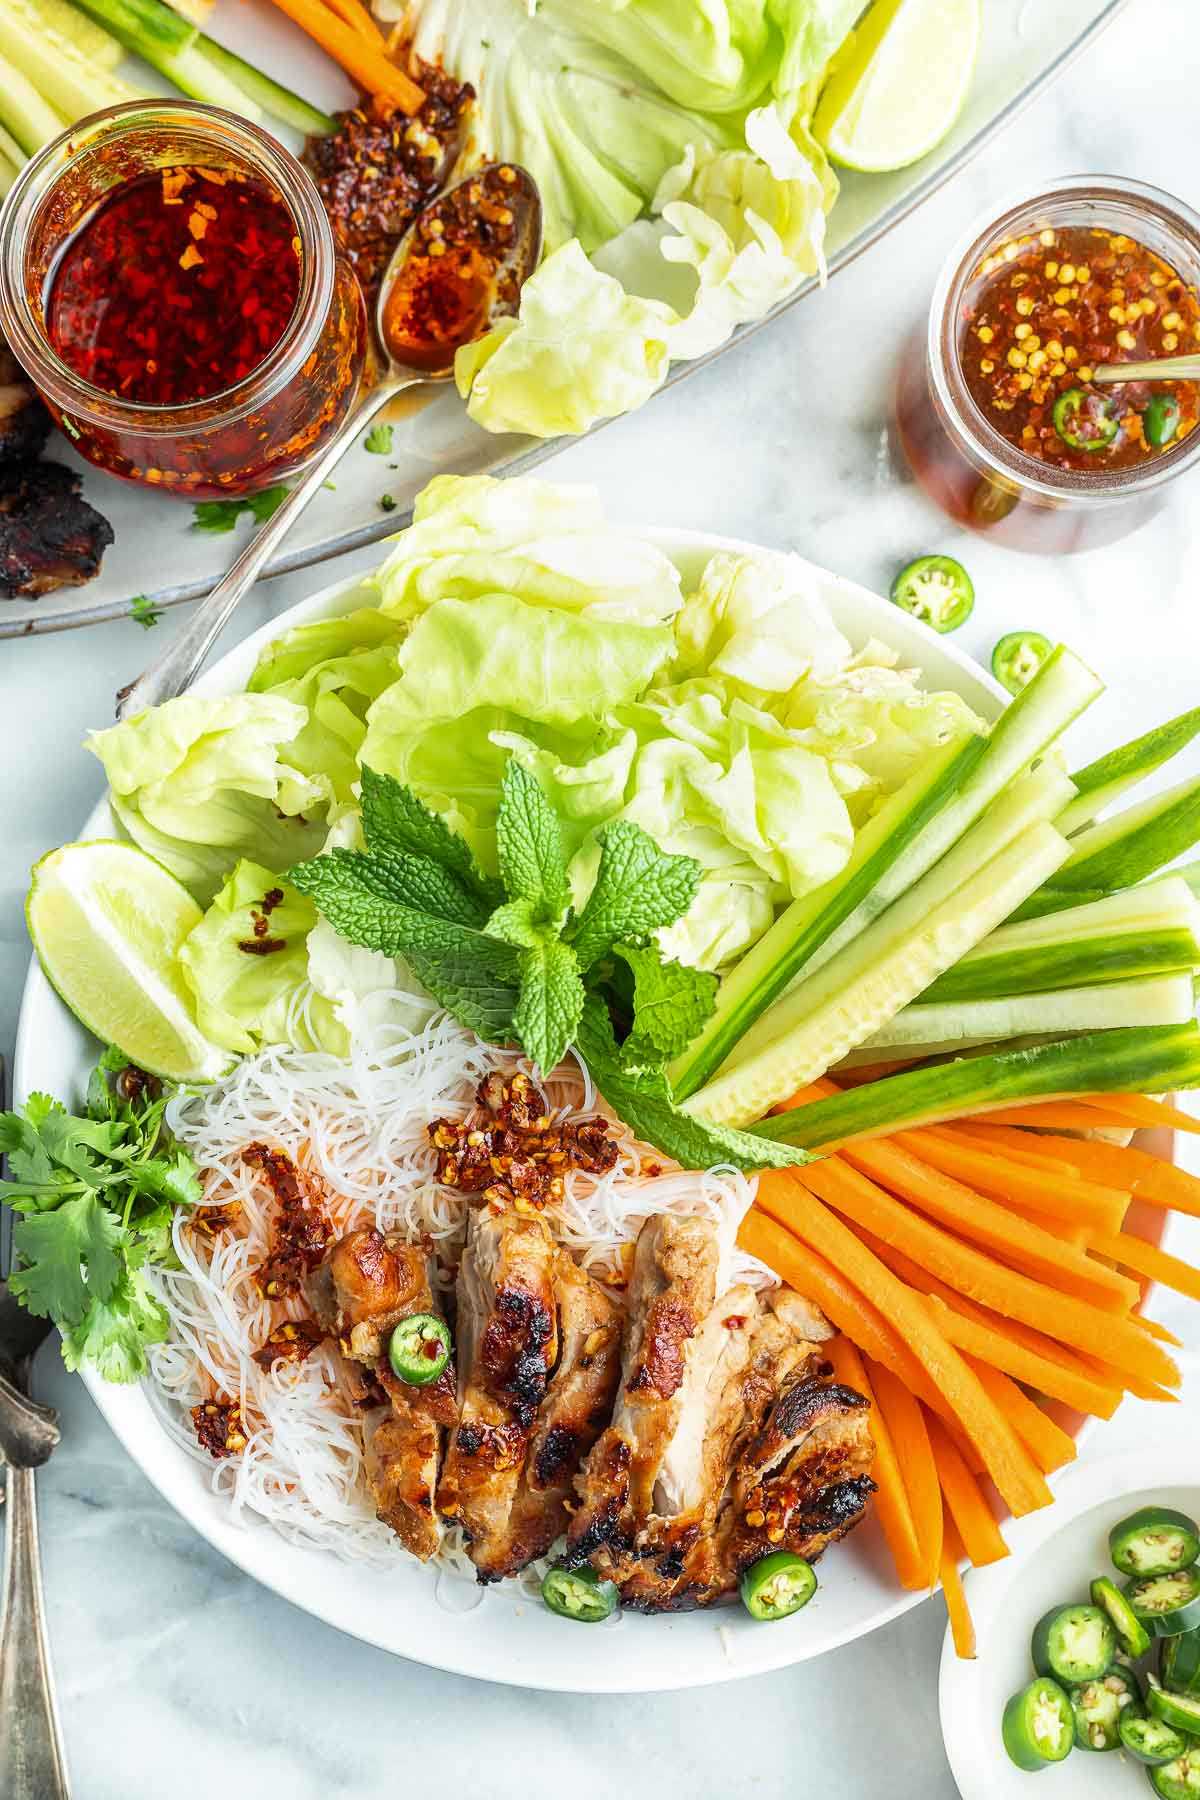 prepared Vietnamese chicken noodle bowl